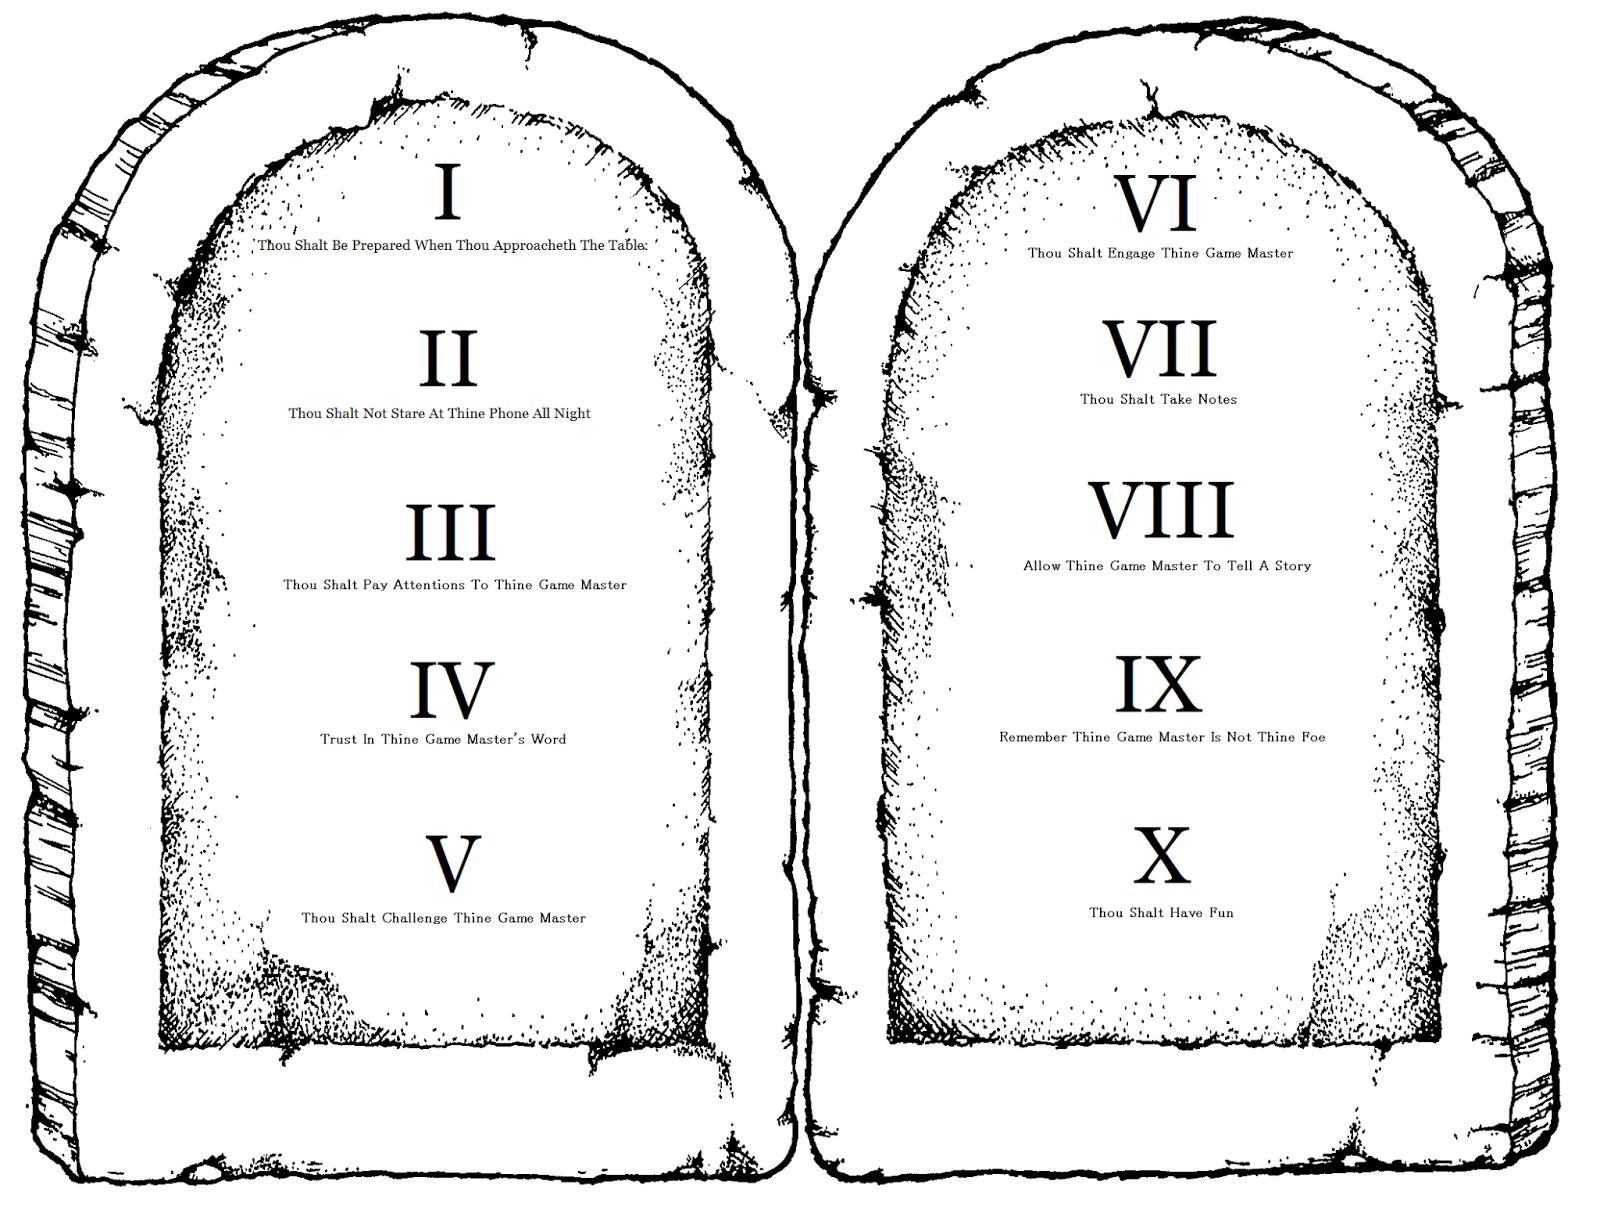 Player Advice: The Players' Ten Commandments